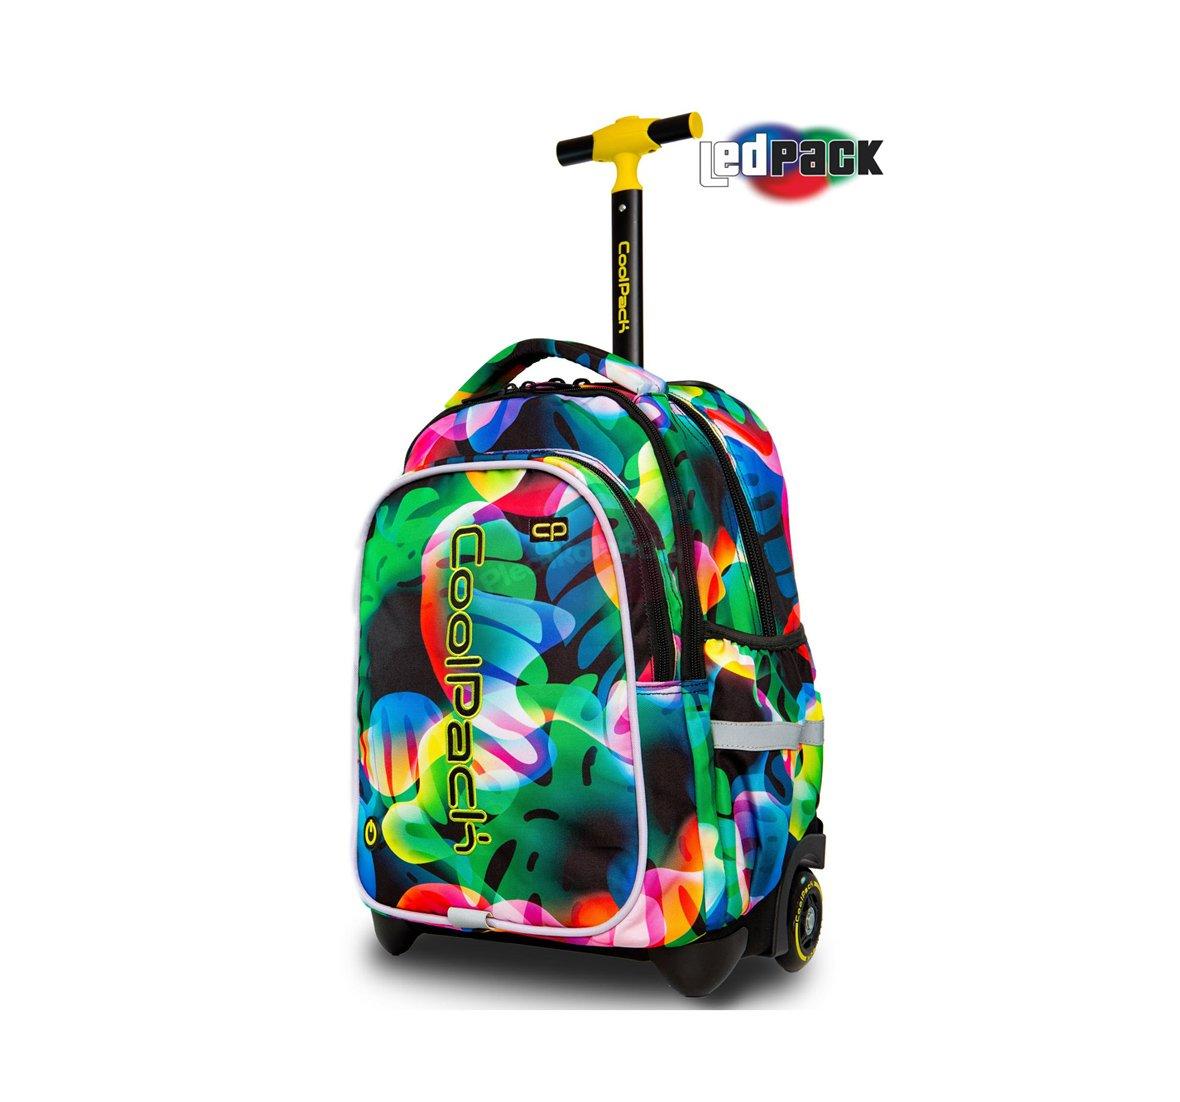 61a65220f61c7 PLECAK Szkolny na kółkach Coolpack Junior LED RAINBOW LEAVES PTR A28210